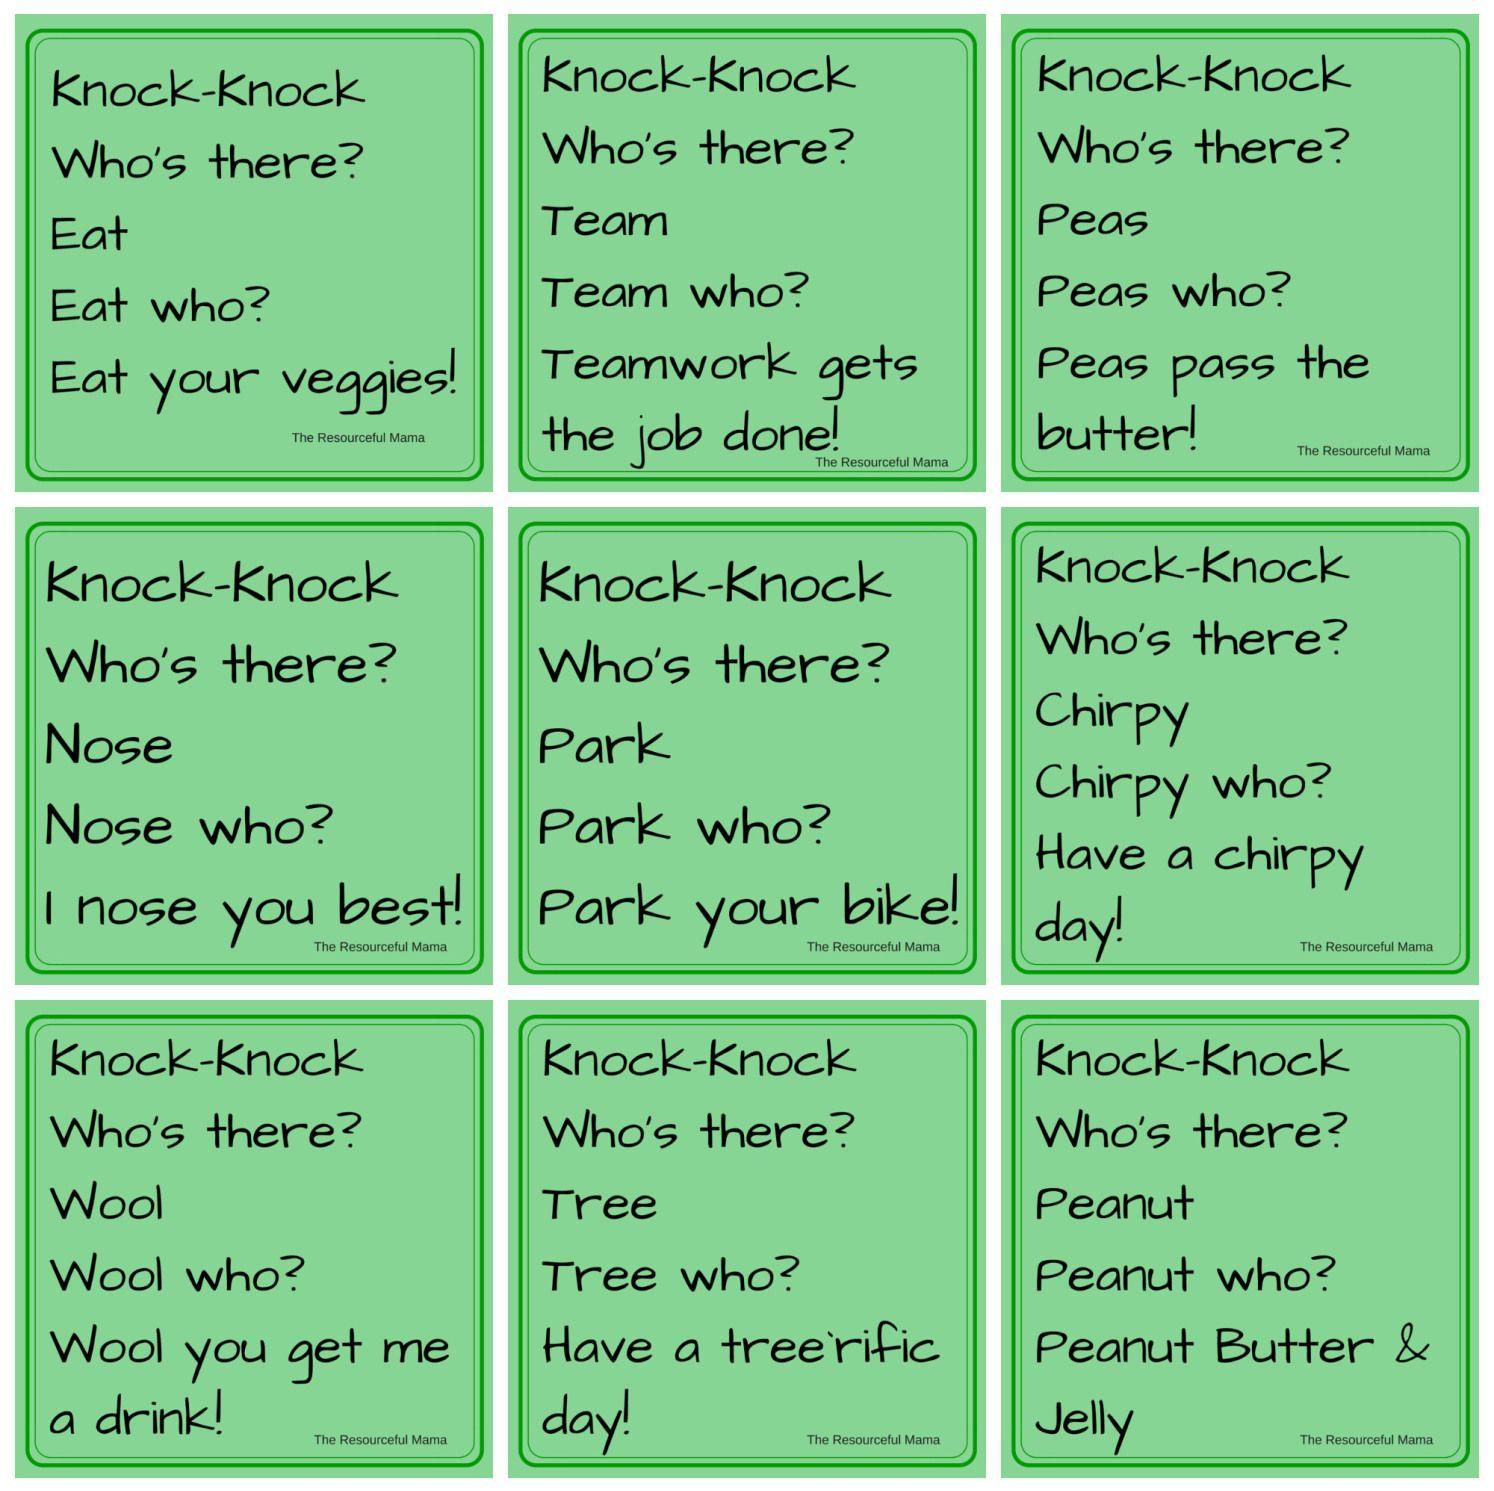 April Fool's Day KnockKnock Jokes for Kids Jokes for